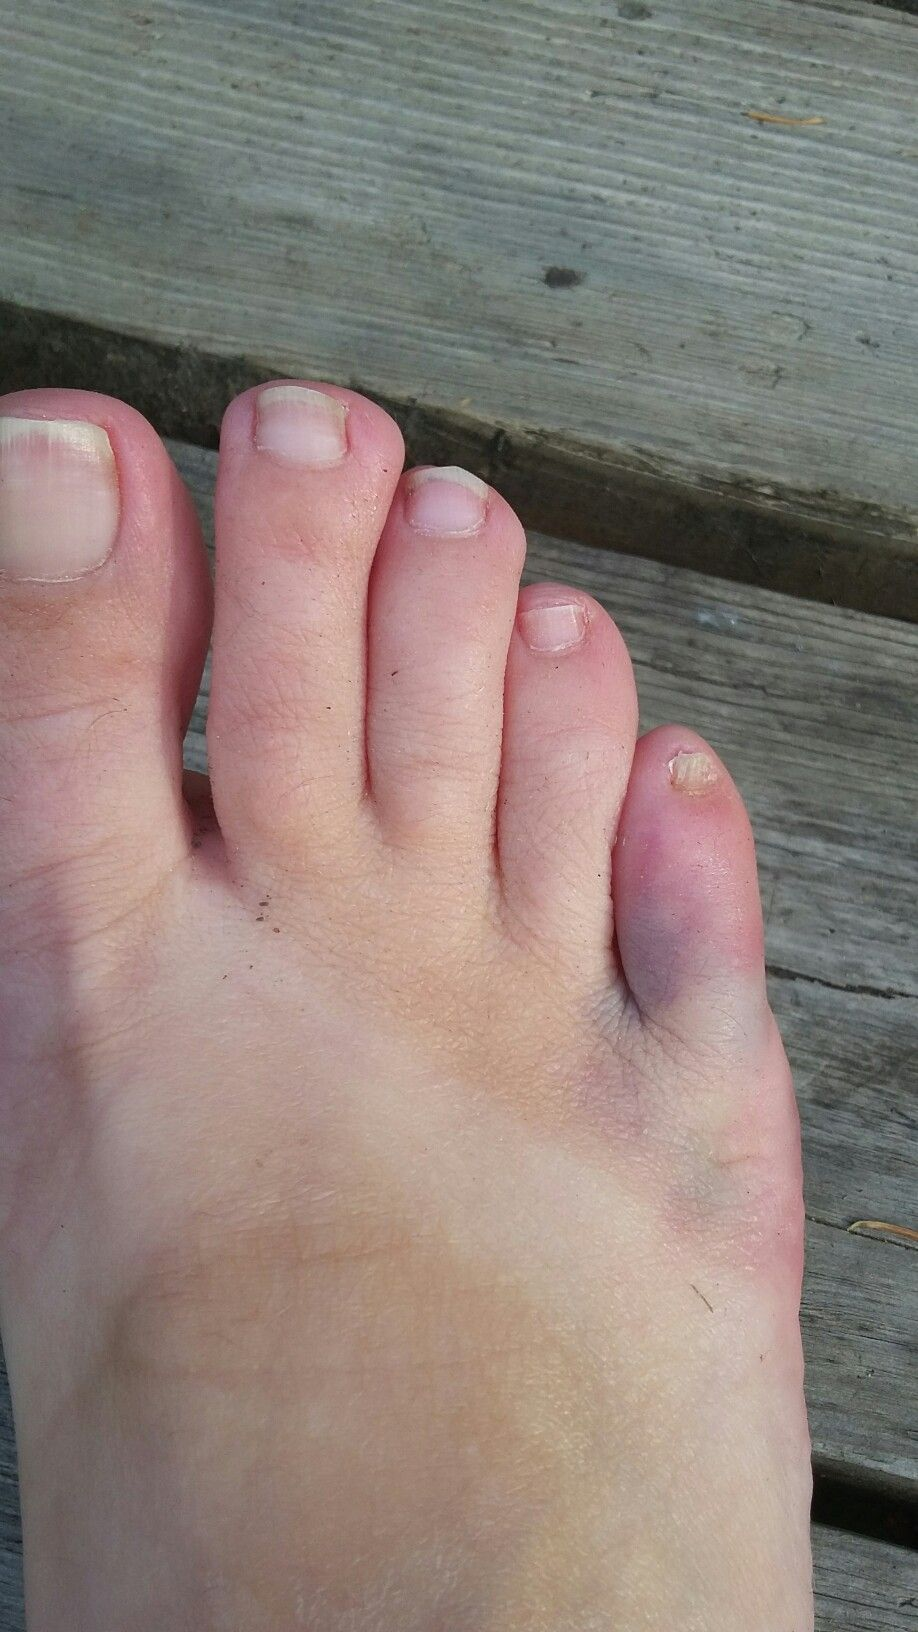 Split Pinky Toenail : split, pinky, toenail, Broken, Pinky, NailsTip